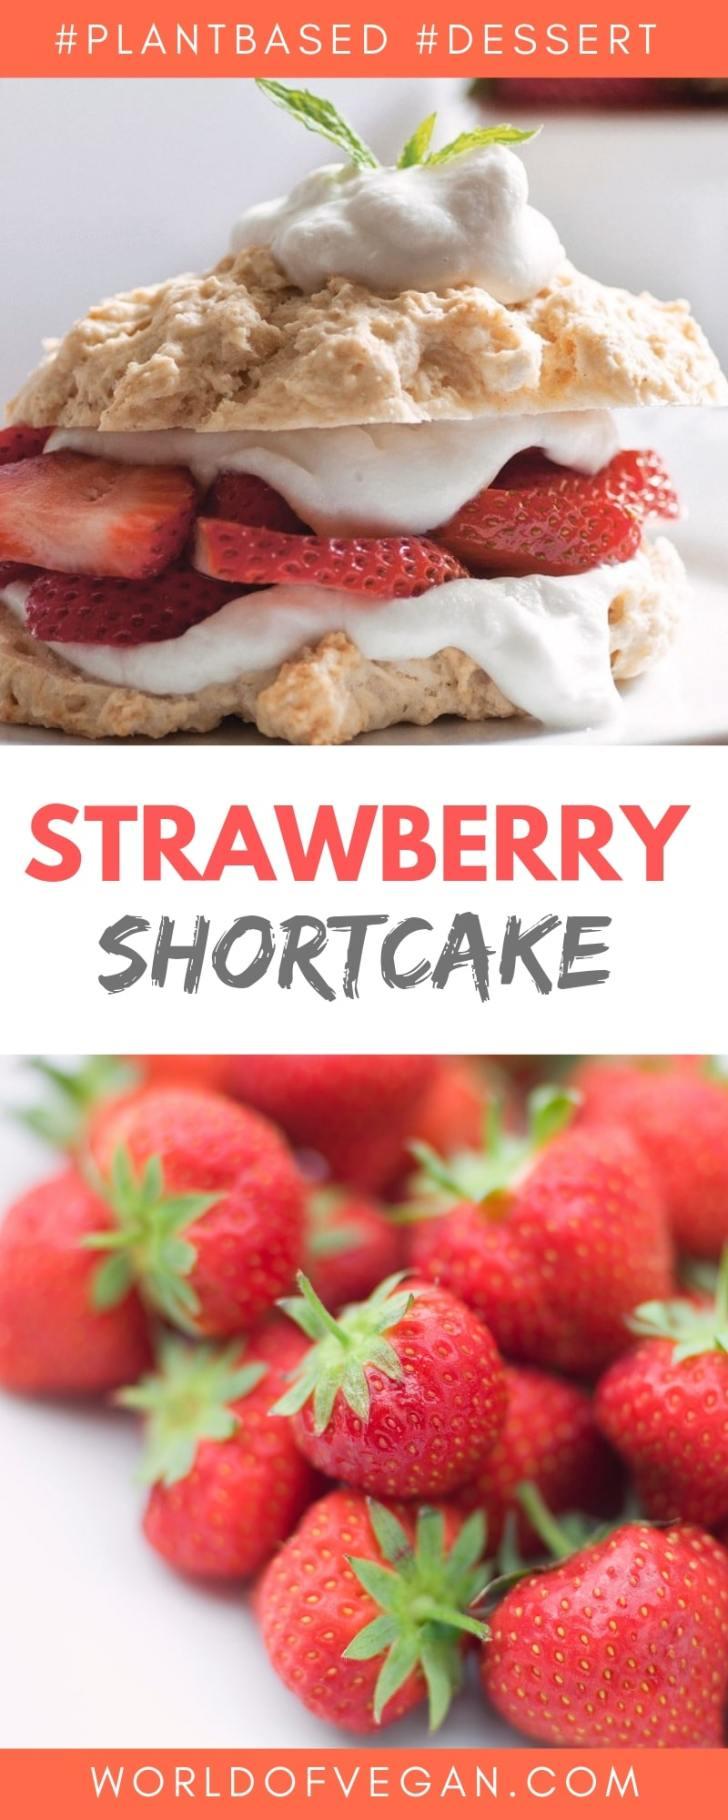 Easy Vegan Strawberry Shortcake Recipe | WorldofVegan.com | #shortcake #cake #picnic #strawberry #tea #party #worldofvegan